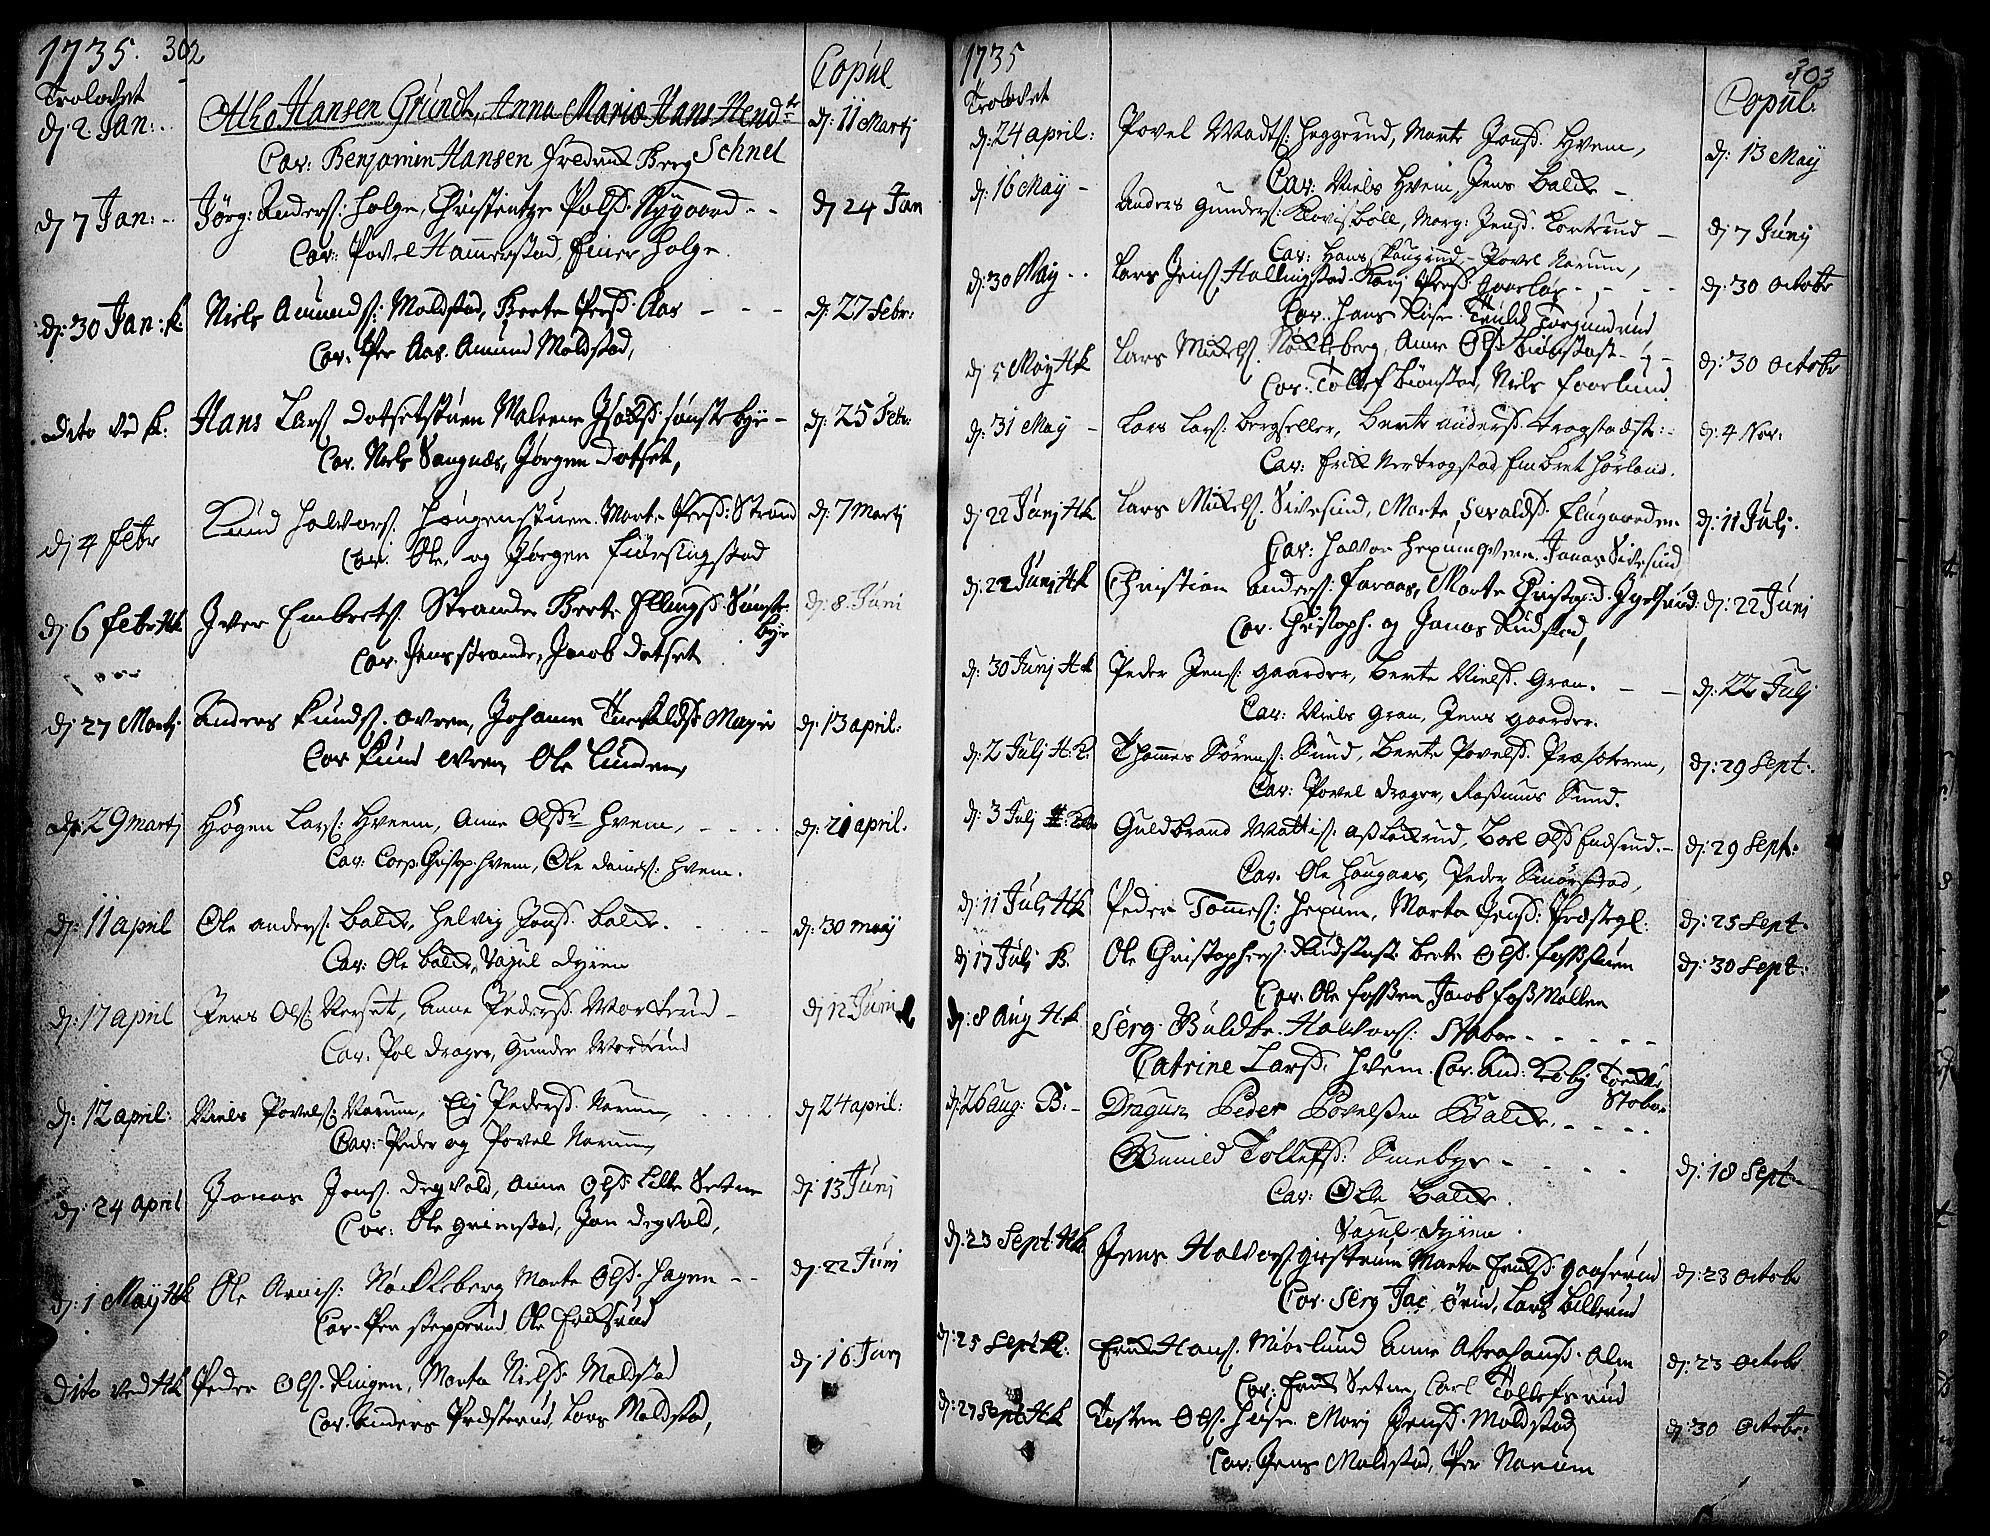 SAH, Toten prestekontor, Ministerialbok nr. 3, 1734-1751, s. 302-303